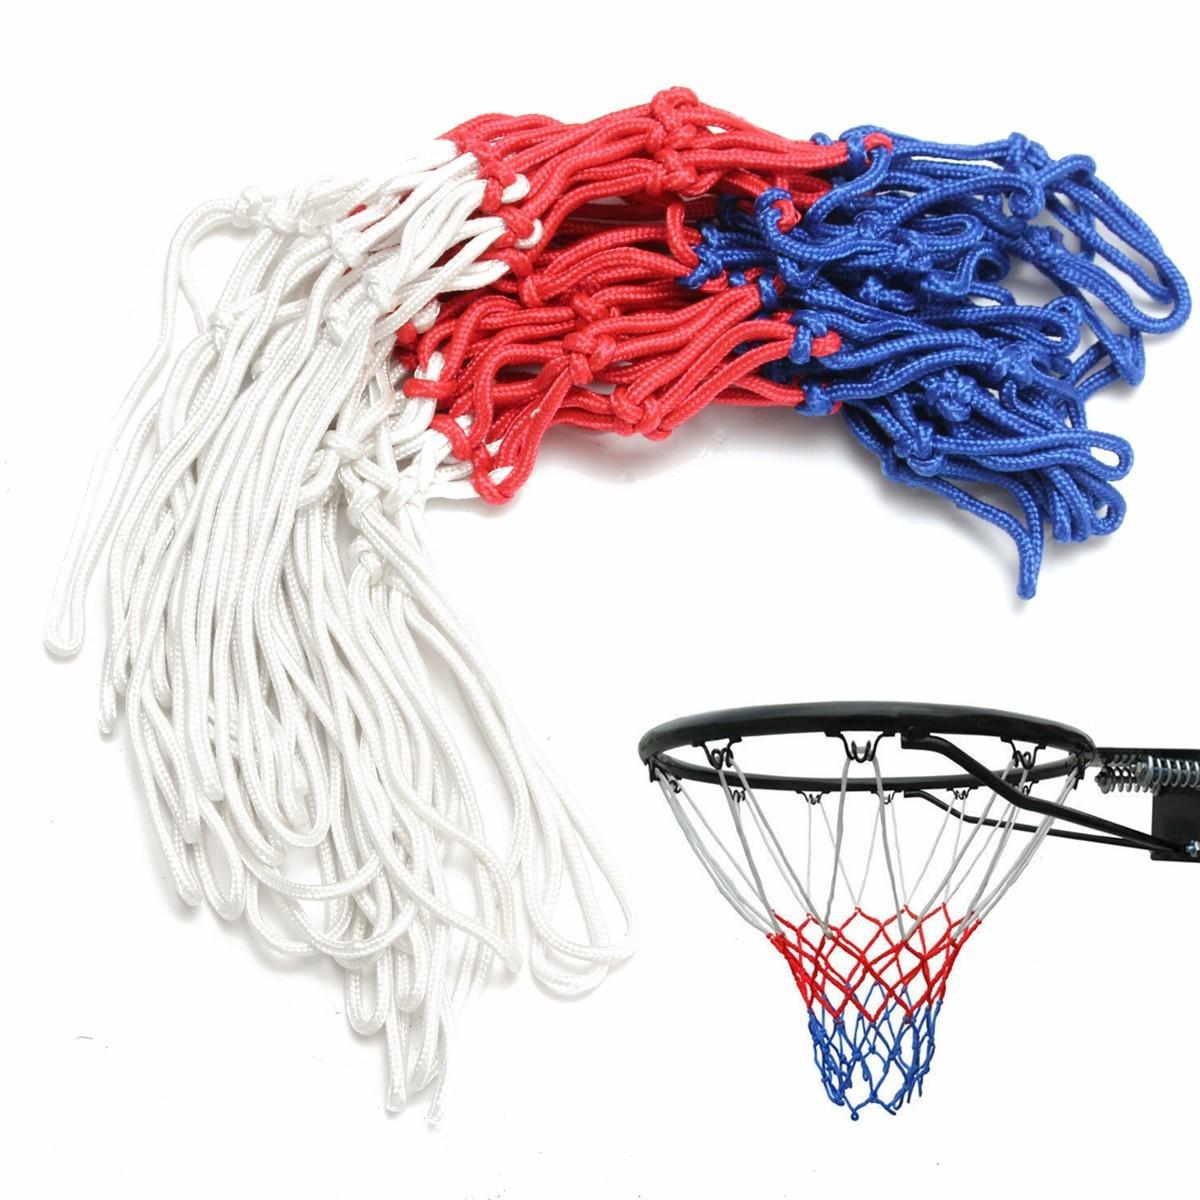 Tahan Lama Dalam Ruangan Olahraga Luar Ruangan Penggantian Ring Basket Nilon Jaring Gawang .